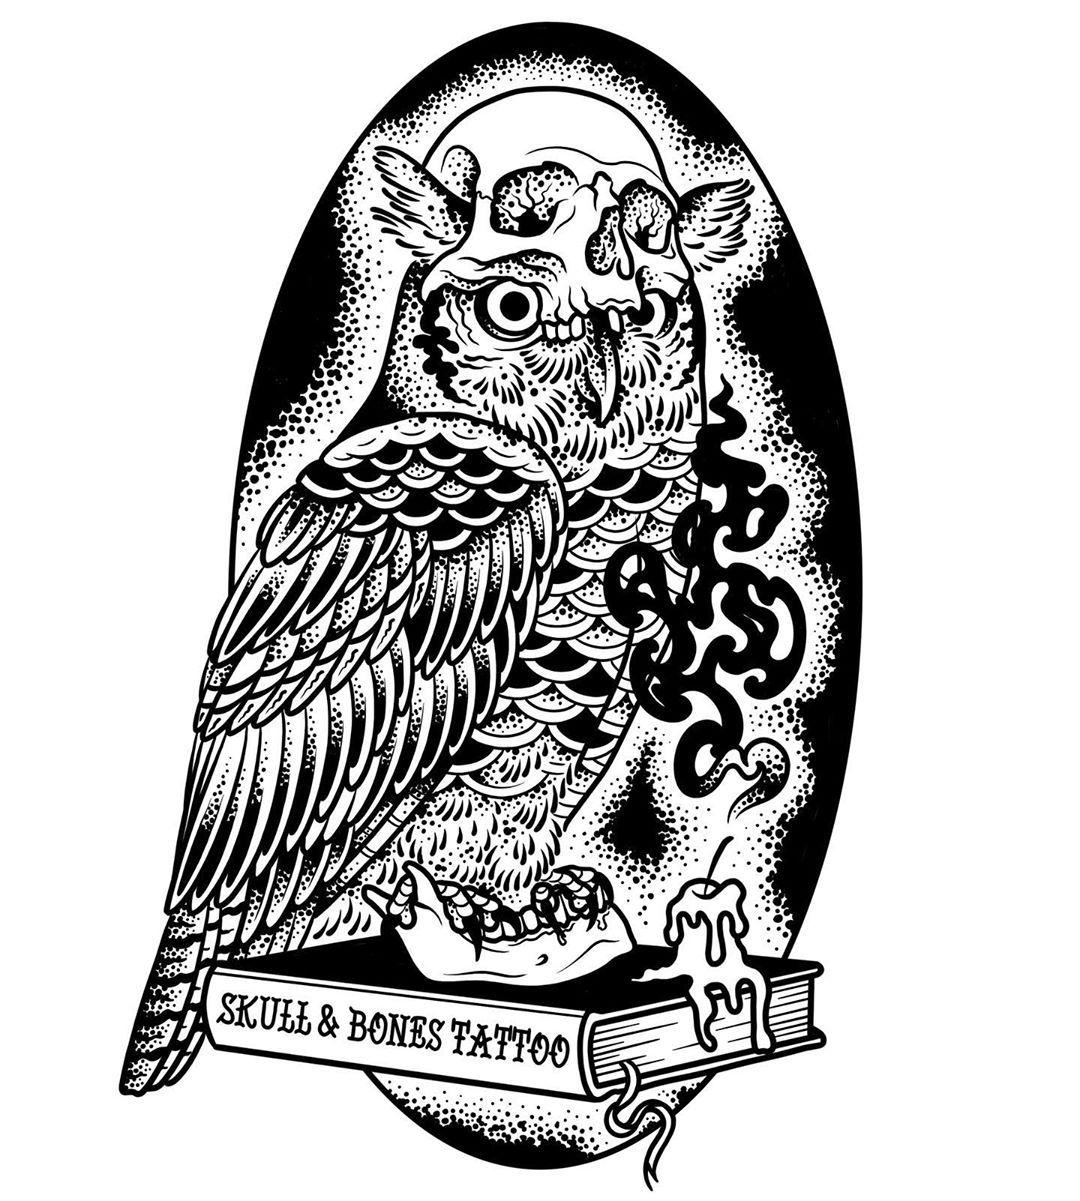 #tattoo #tattooflash #traditional #traditionaltattoo #traditionaltattooflash #traditionalspain #traditionalkings #oldschooltattoo #neotraditional #neotraditionaltattoo #onmissionmachines #tpctattoo #darkartists #blxckink #blackworkers #tattooworkers #flashworkers #oldworkers #owl #skull #candle #book #skullandbones #buho #calavera #libro #ipadpro #ipadproart #ipadprotattooteam #procreate